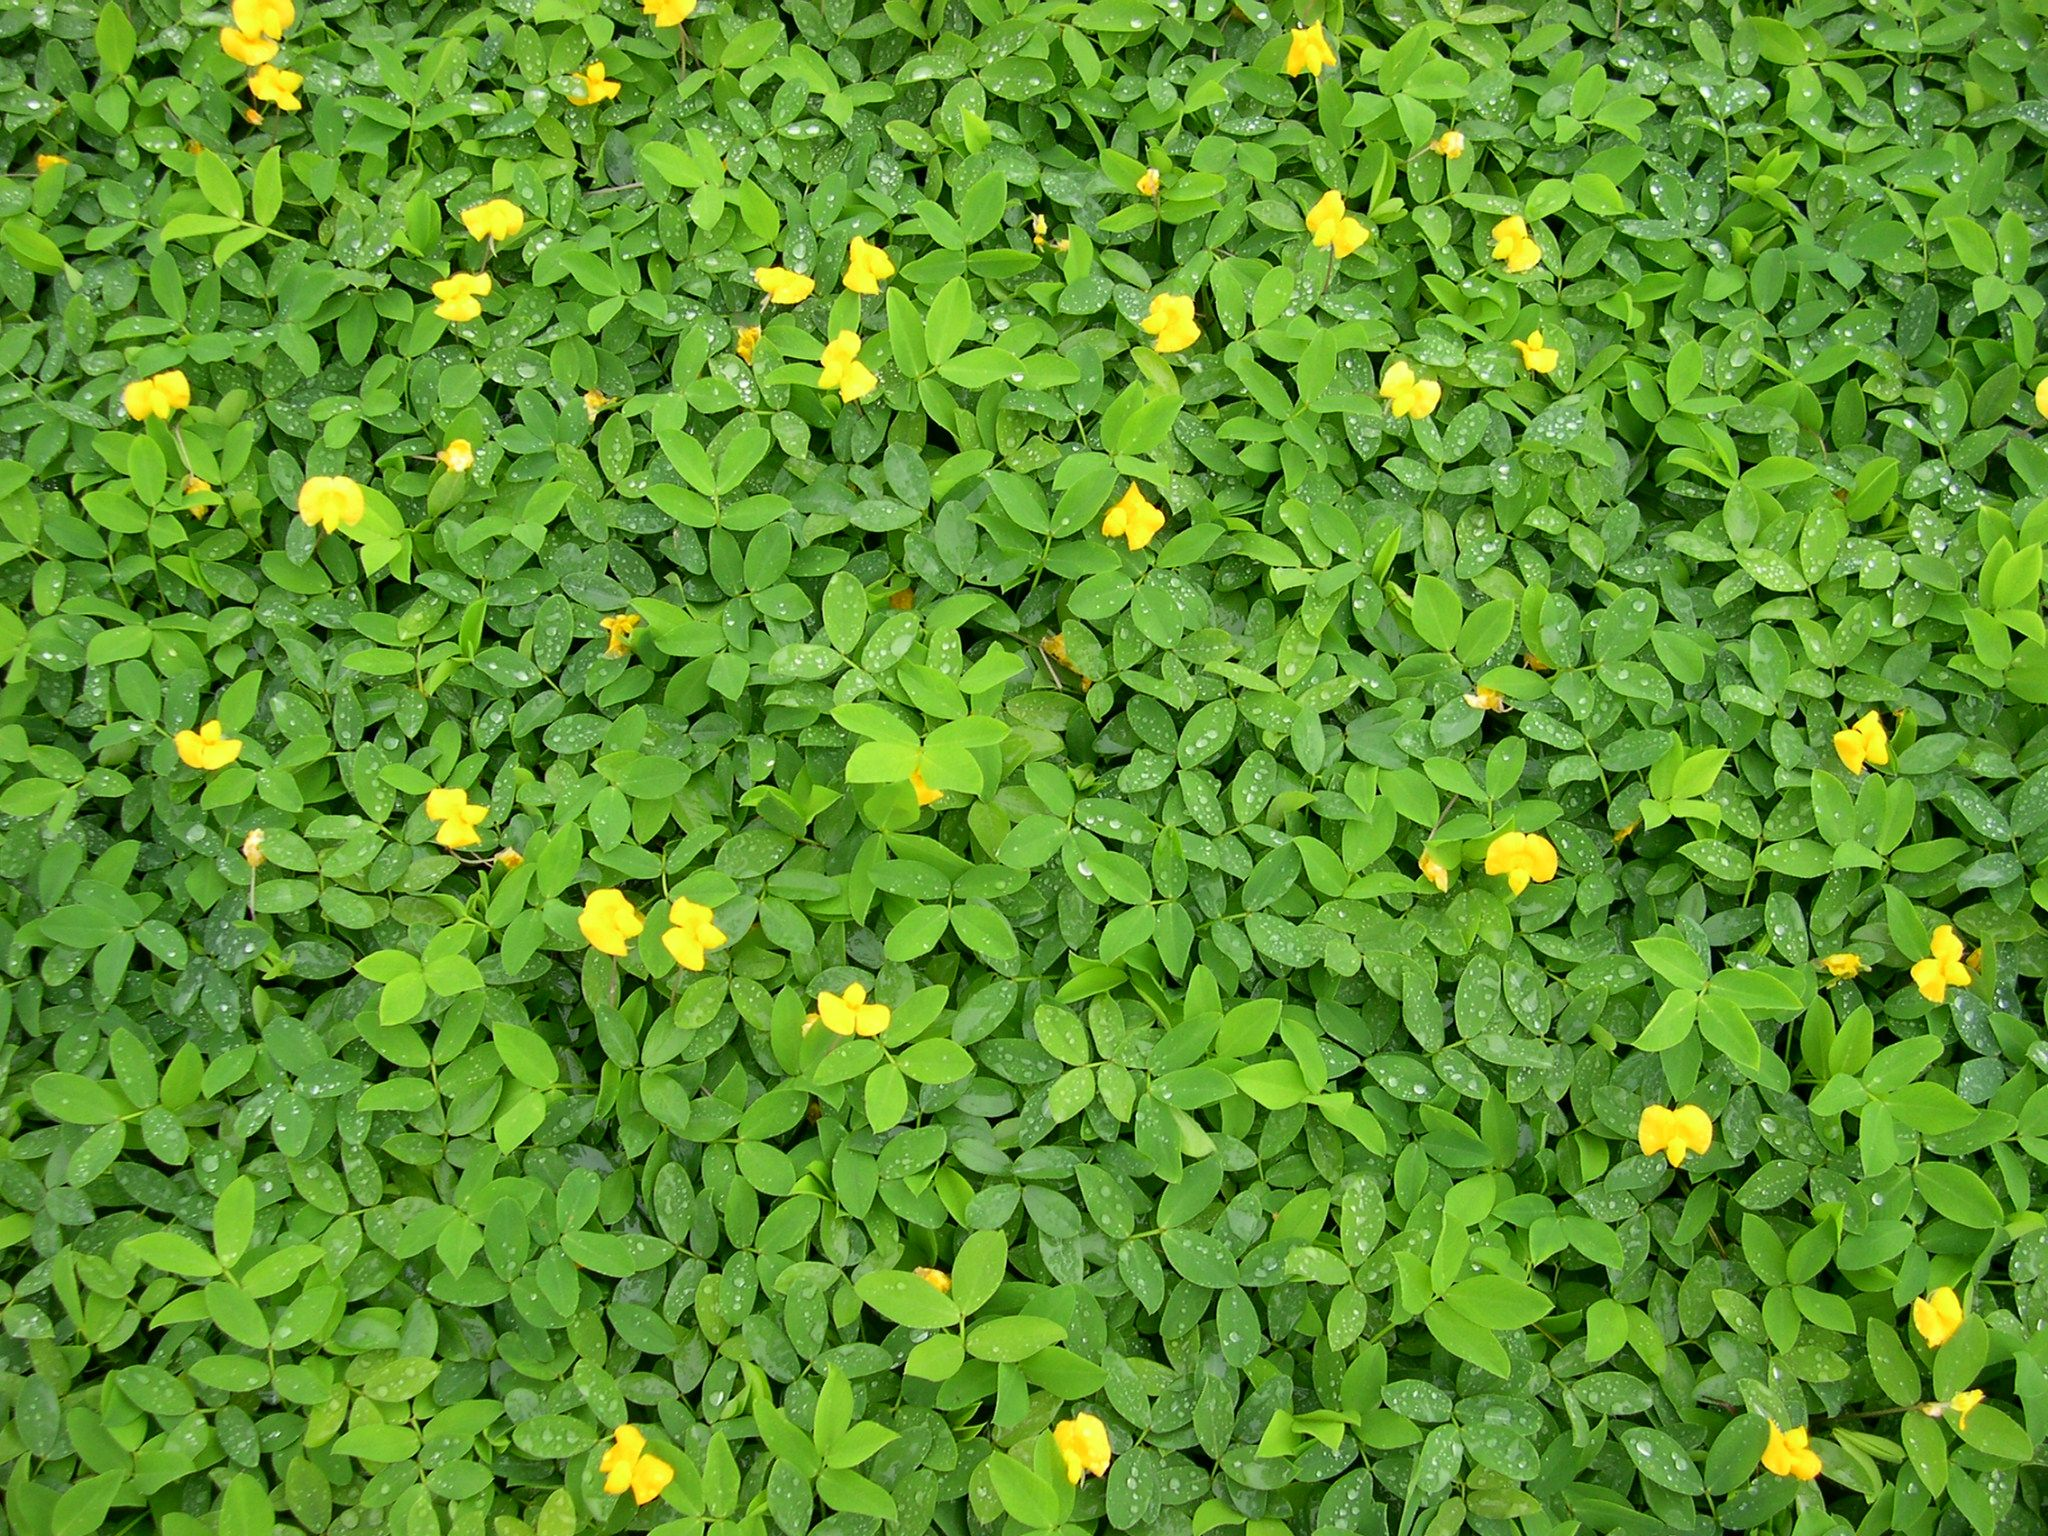 Central Florida Landscape Plants | Turfgrass alternatives offer ...